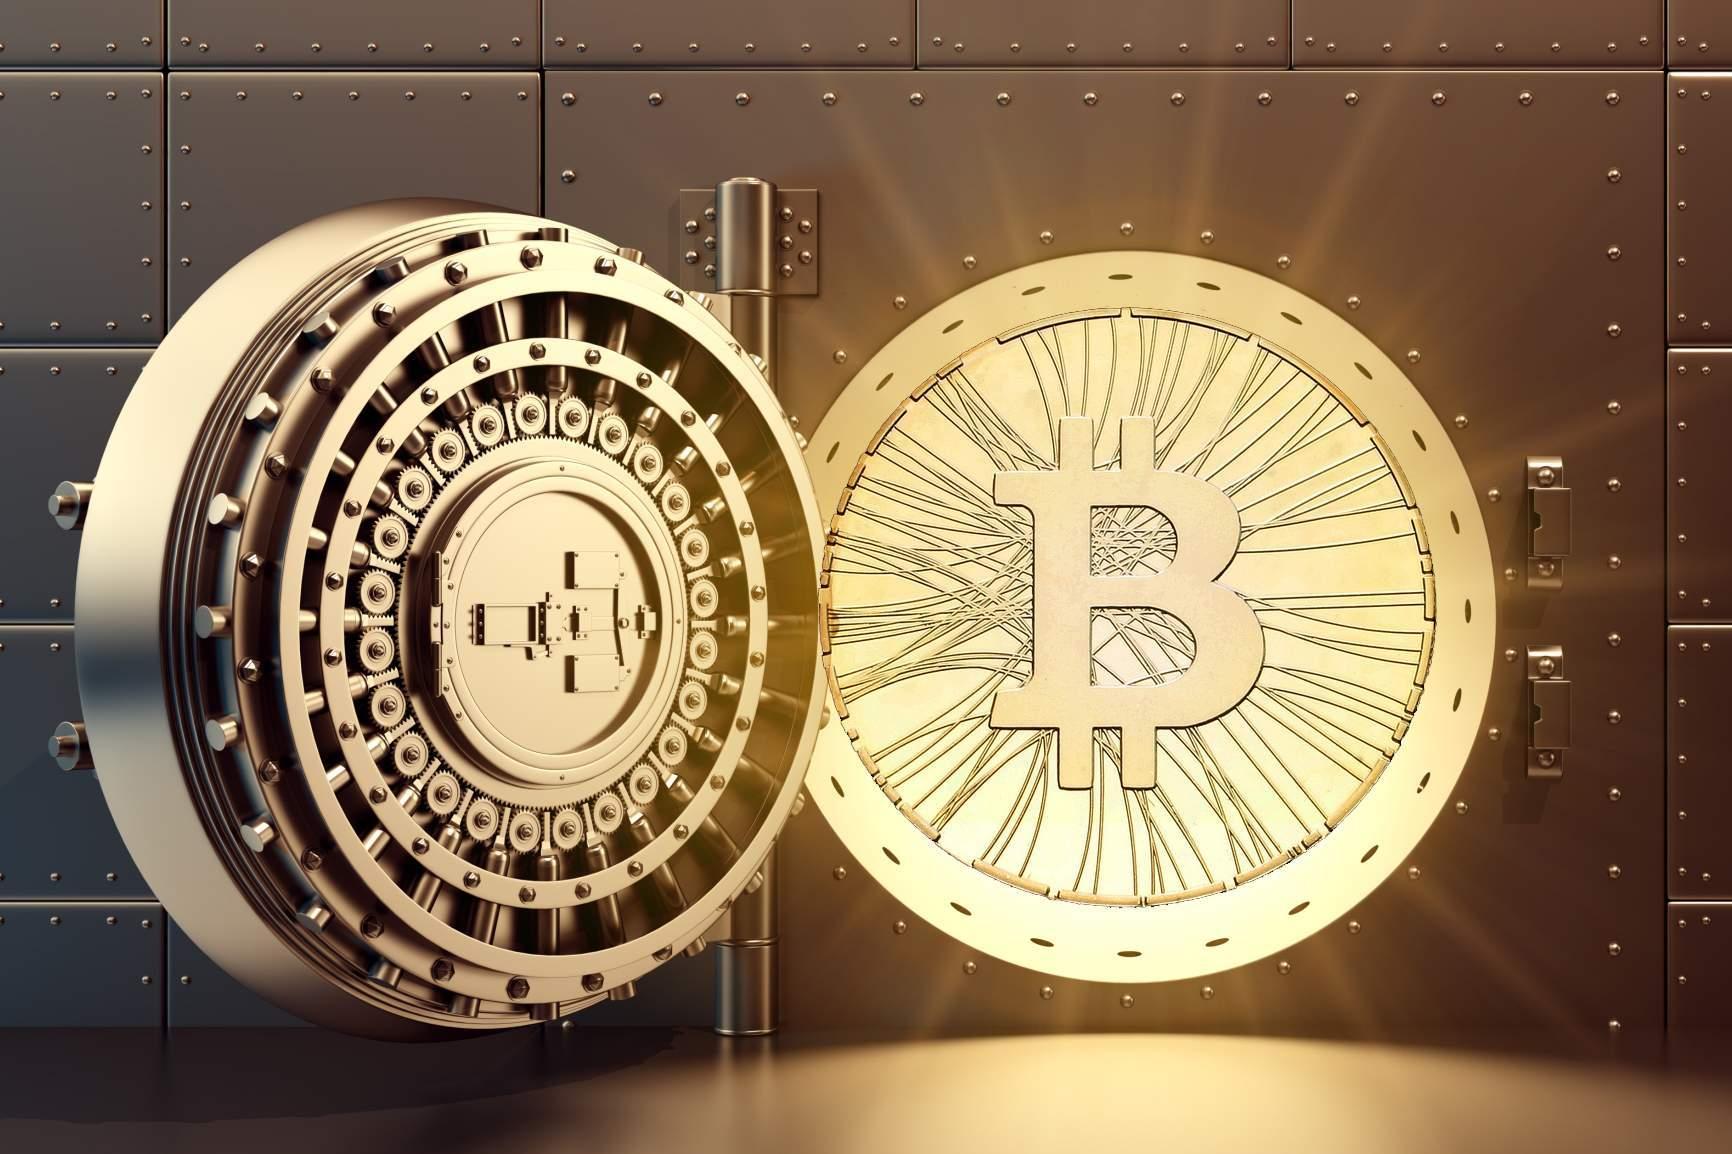 """Esqueça o ouro, compre Bitcoin"", diz comercial de empresa de criptomoedas dos EUA"